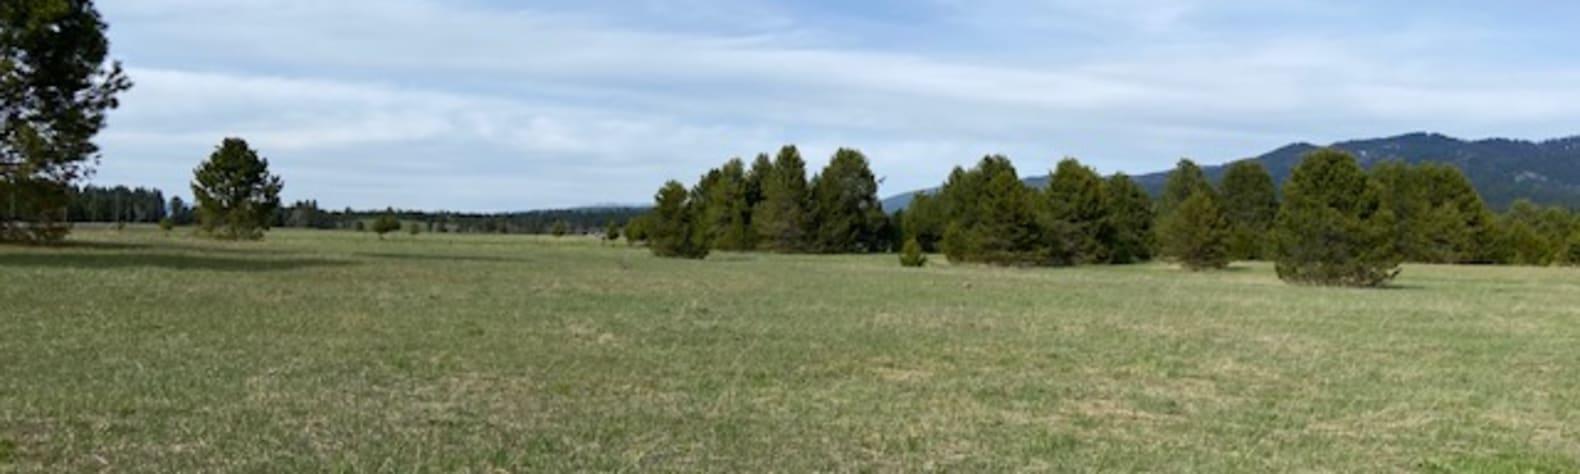 Brian S.'s Land